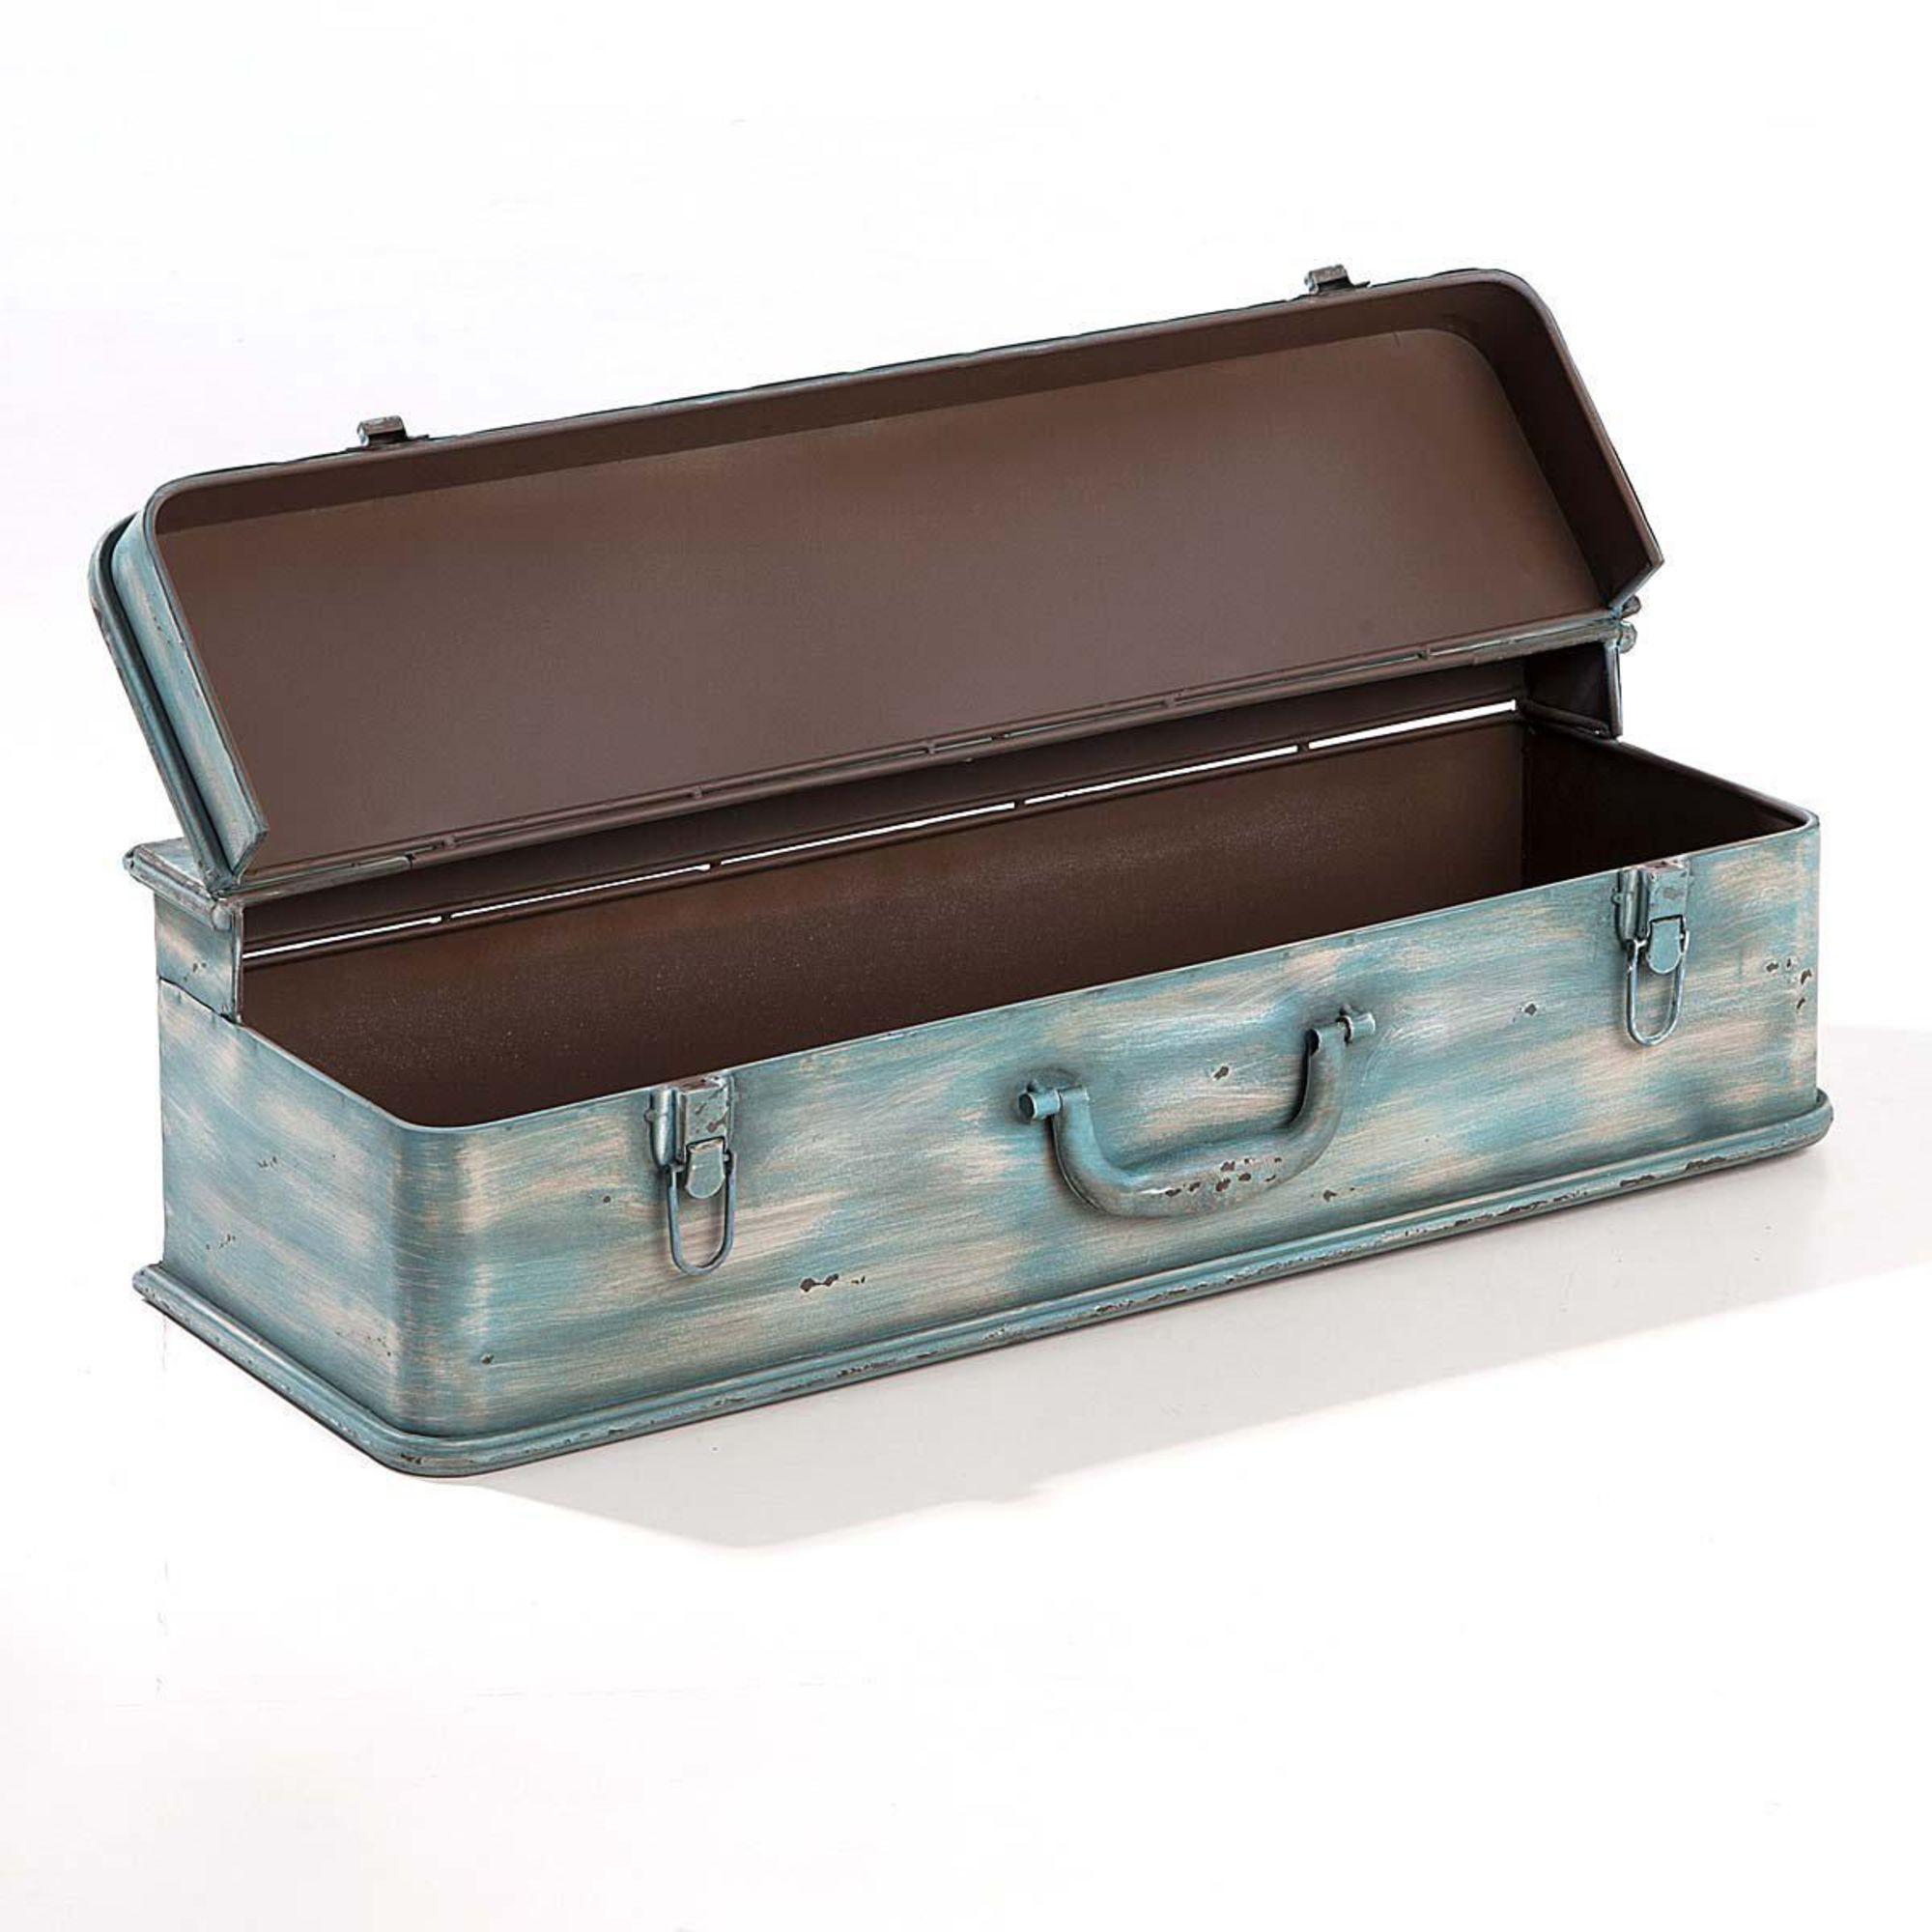 wandregal koffer blau truhe vintage wandtruhe b66 x t23 x h18 5 cm. Black Bedroom Furniture Sets. Home Design Ideas